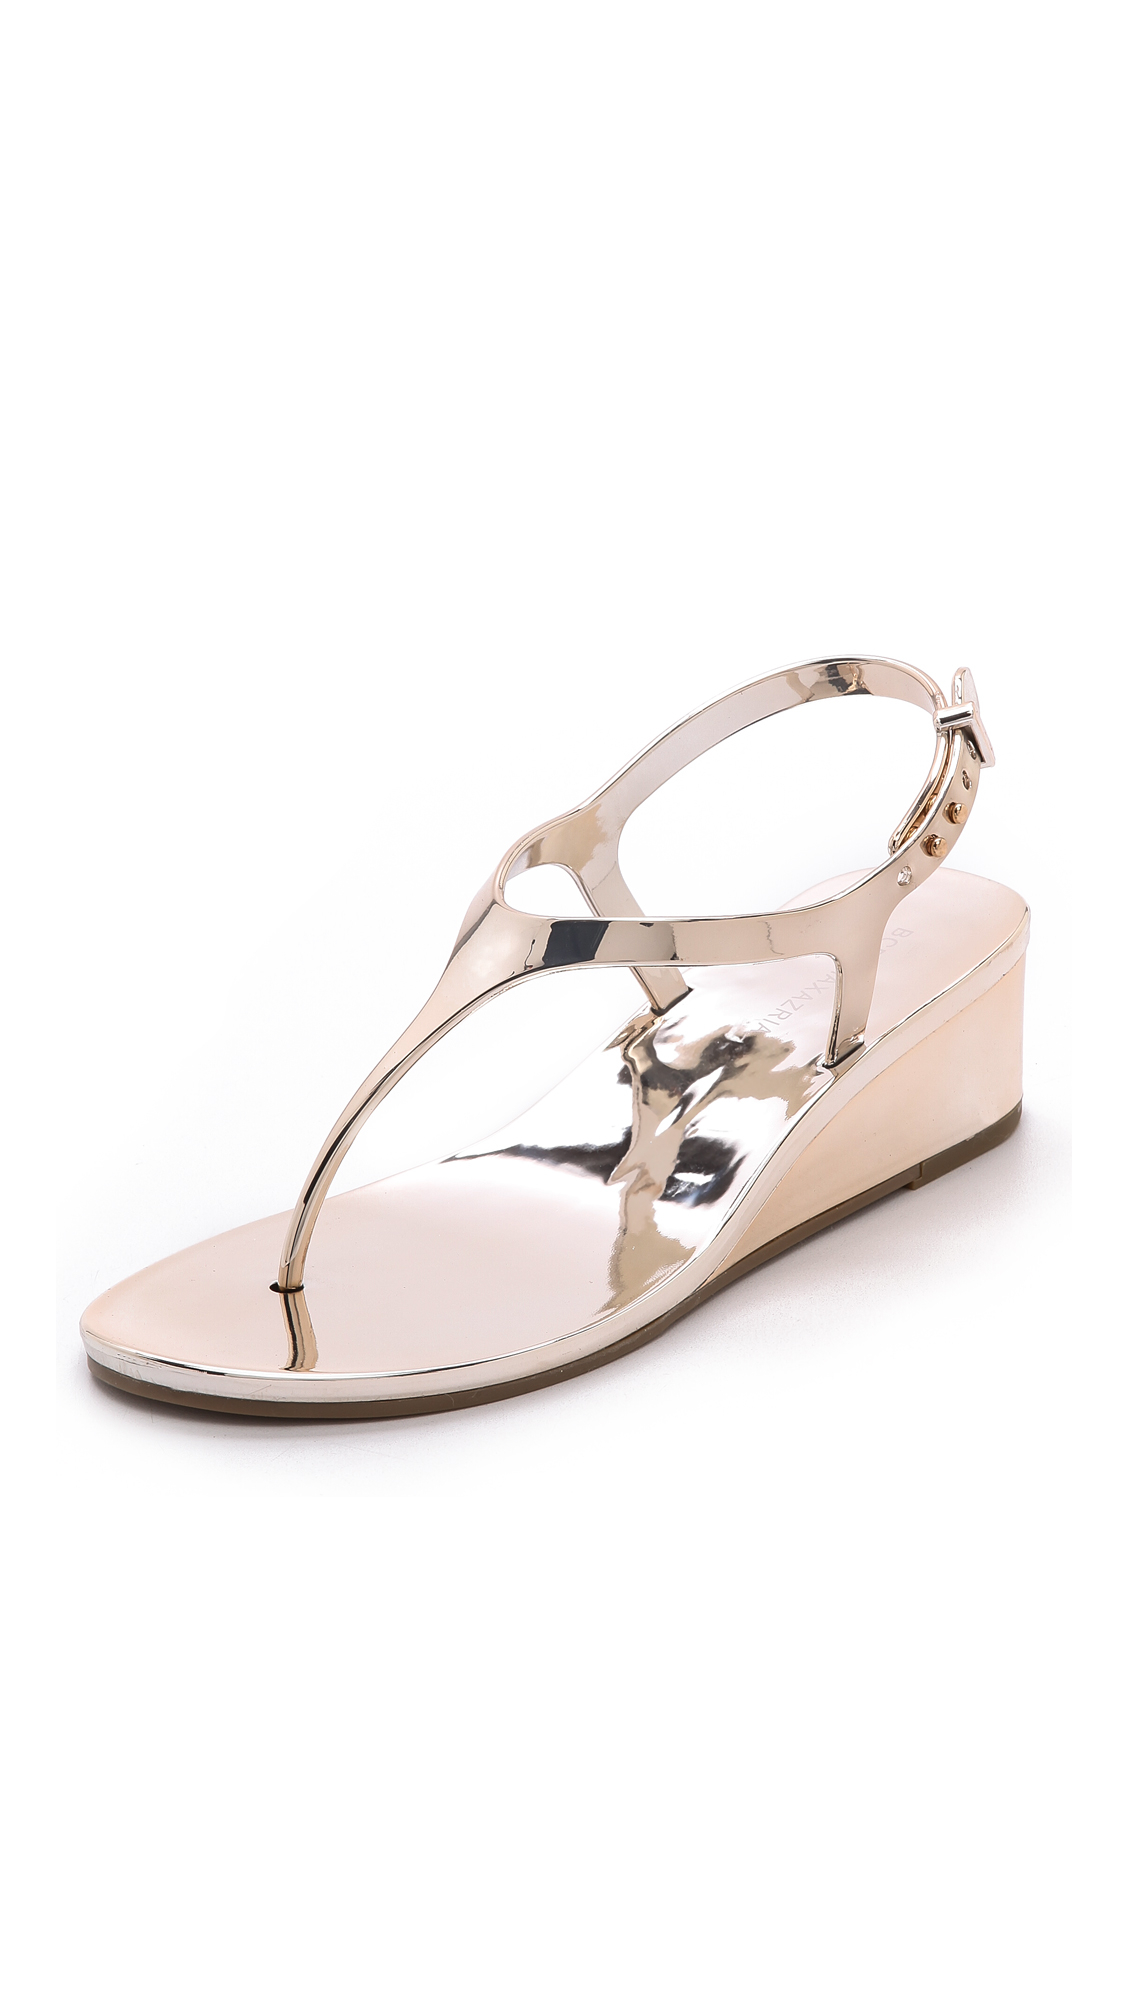 6bd194d99 Lyst - BCBGMAXAZRIA Silva Wedge Jelly Sandals Silver in Pink